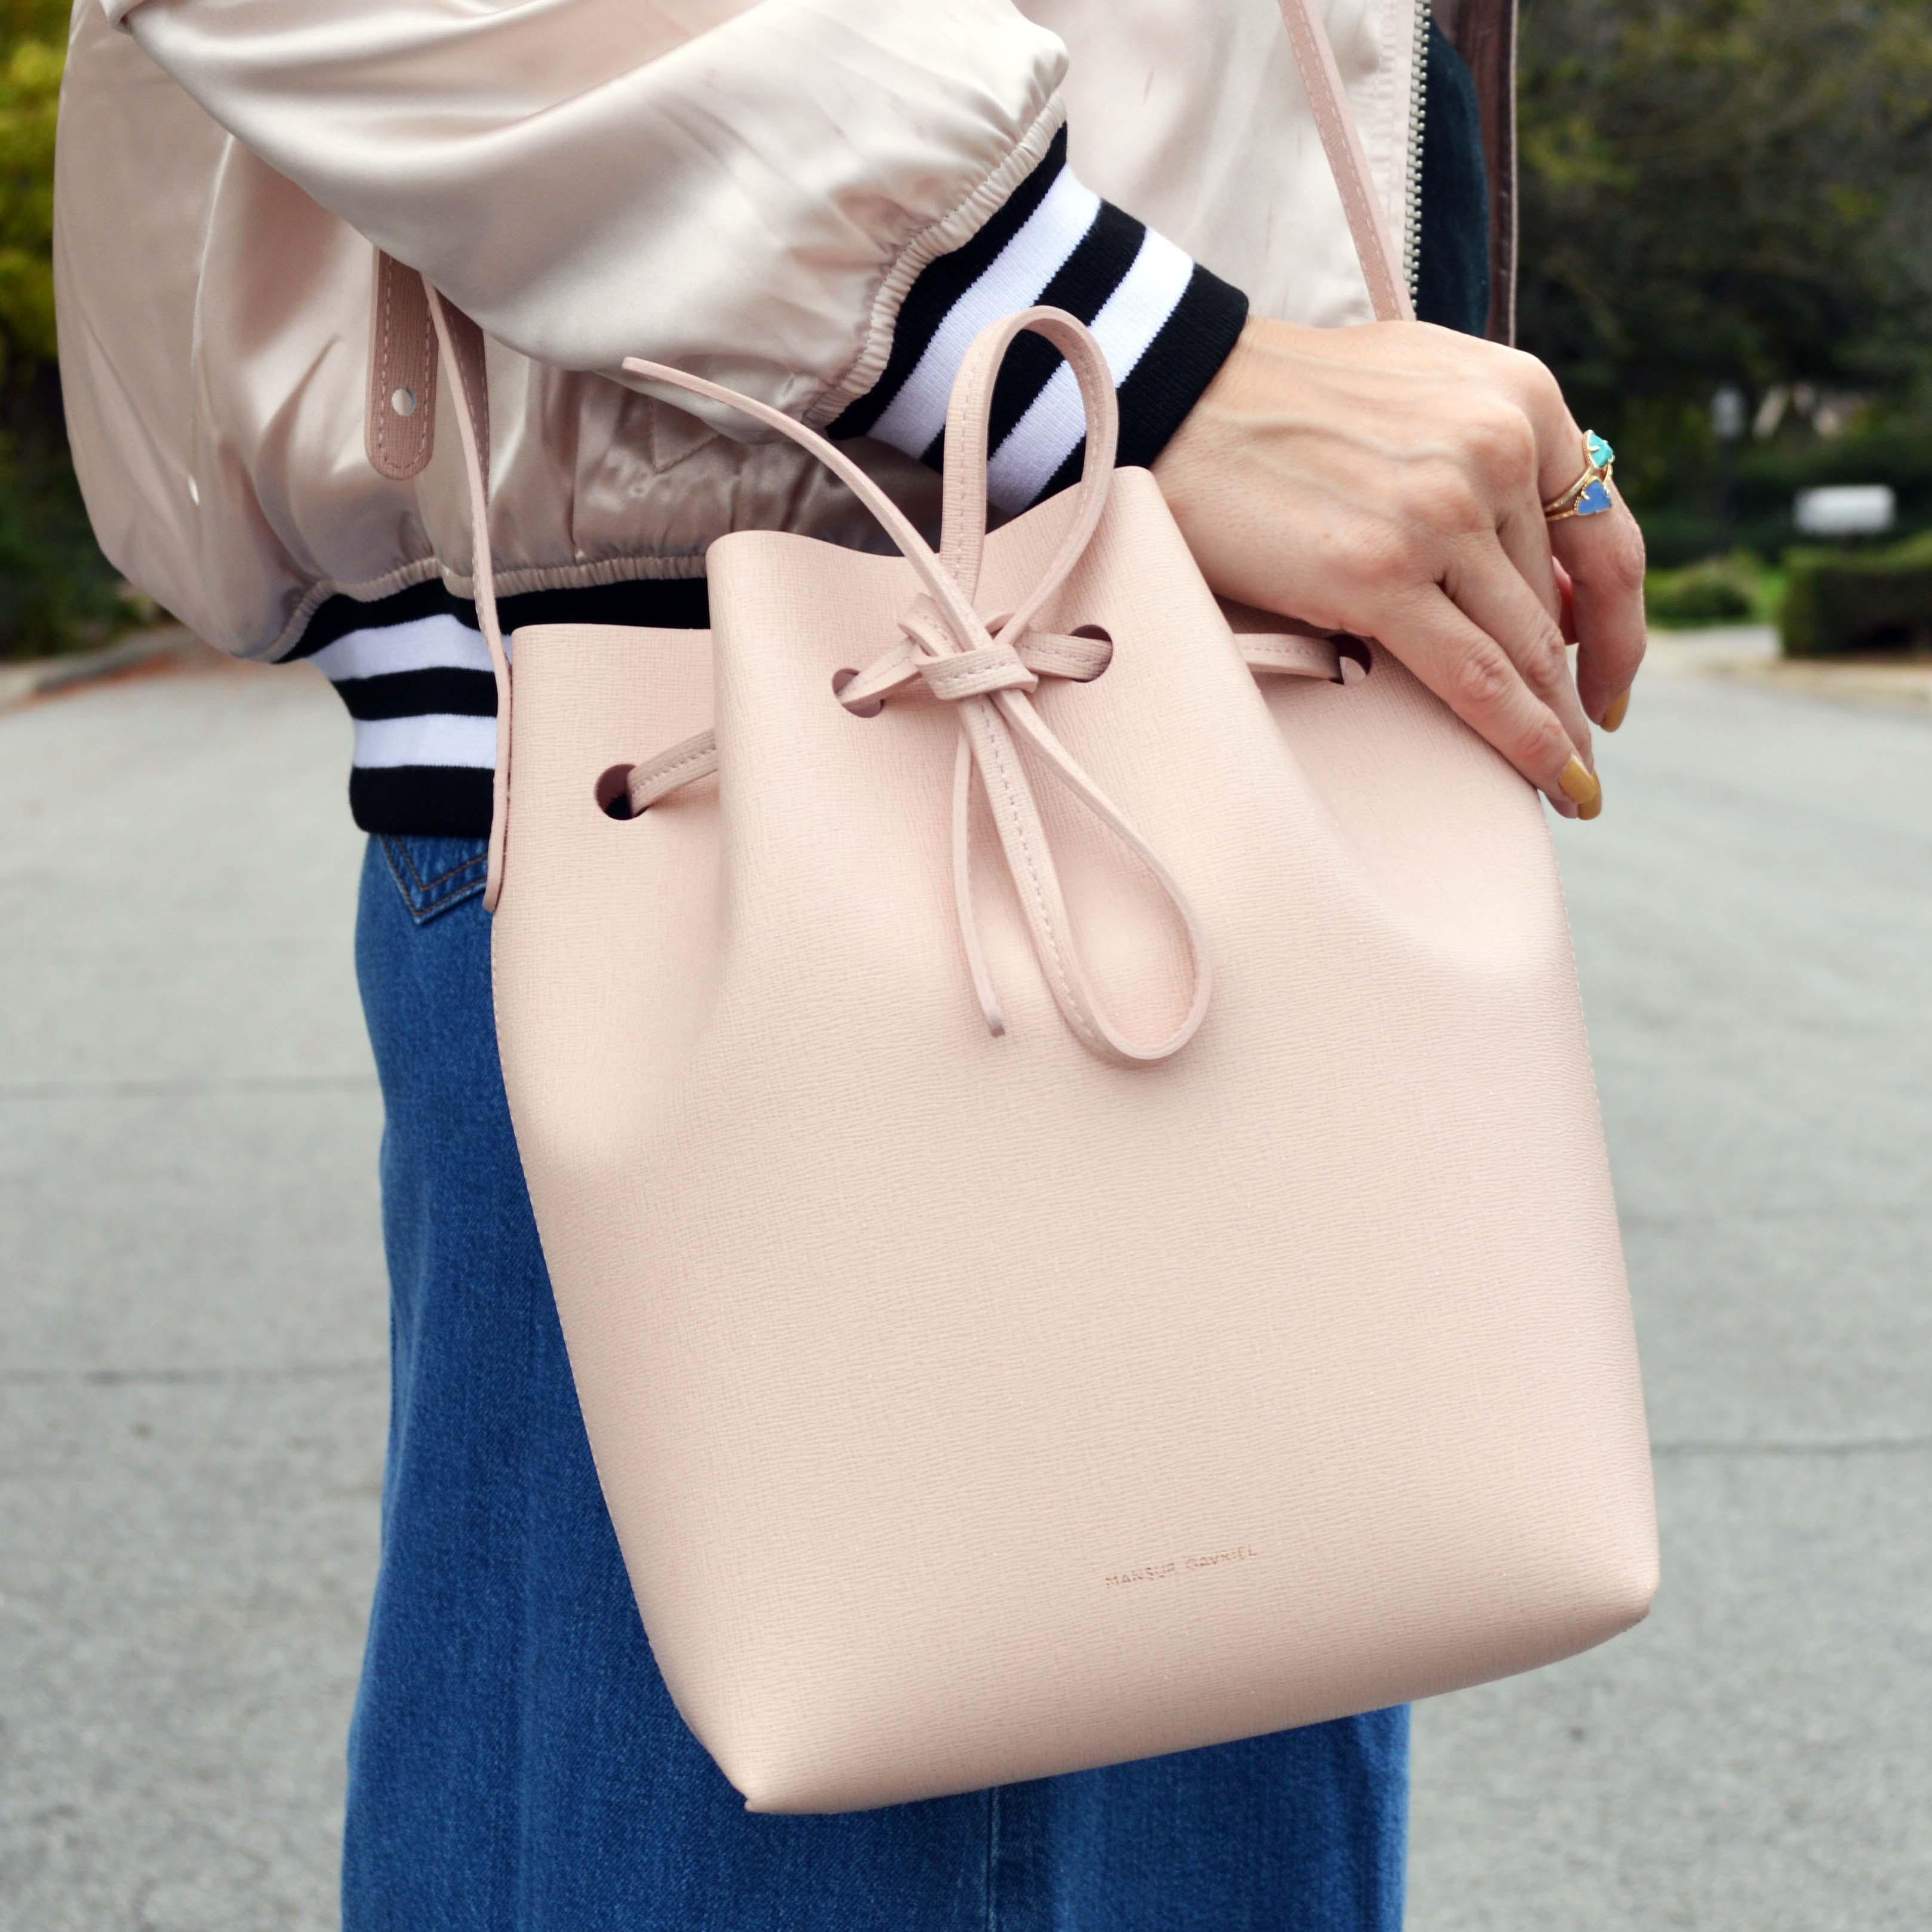 b5e39a64de2c pink mansur gavriel bucket bag 1 – Bay Area Fashionista